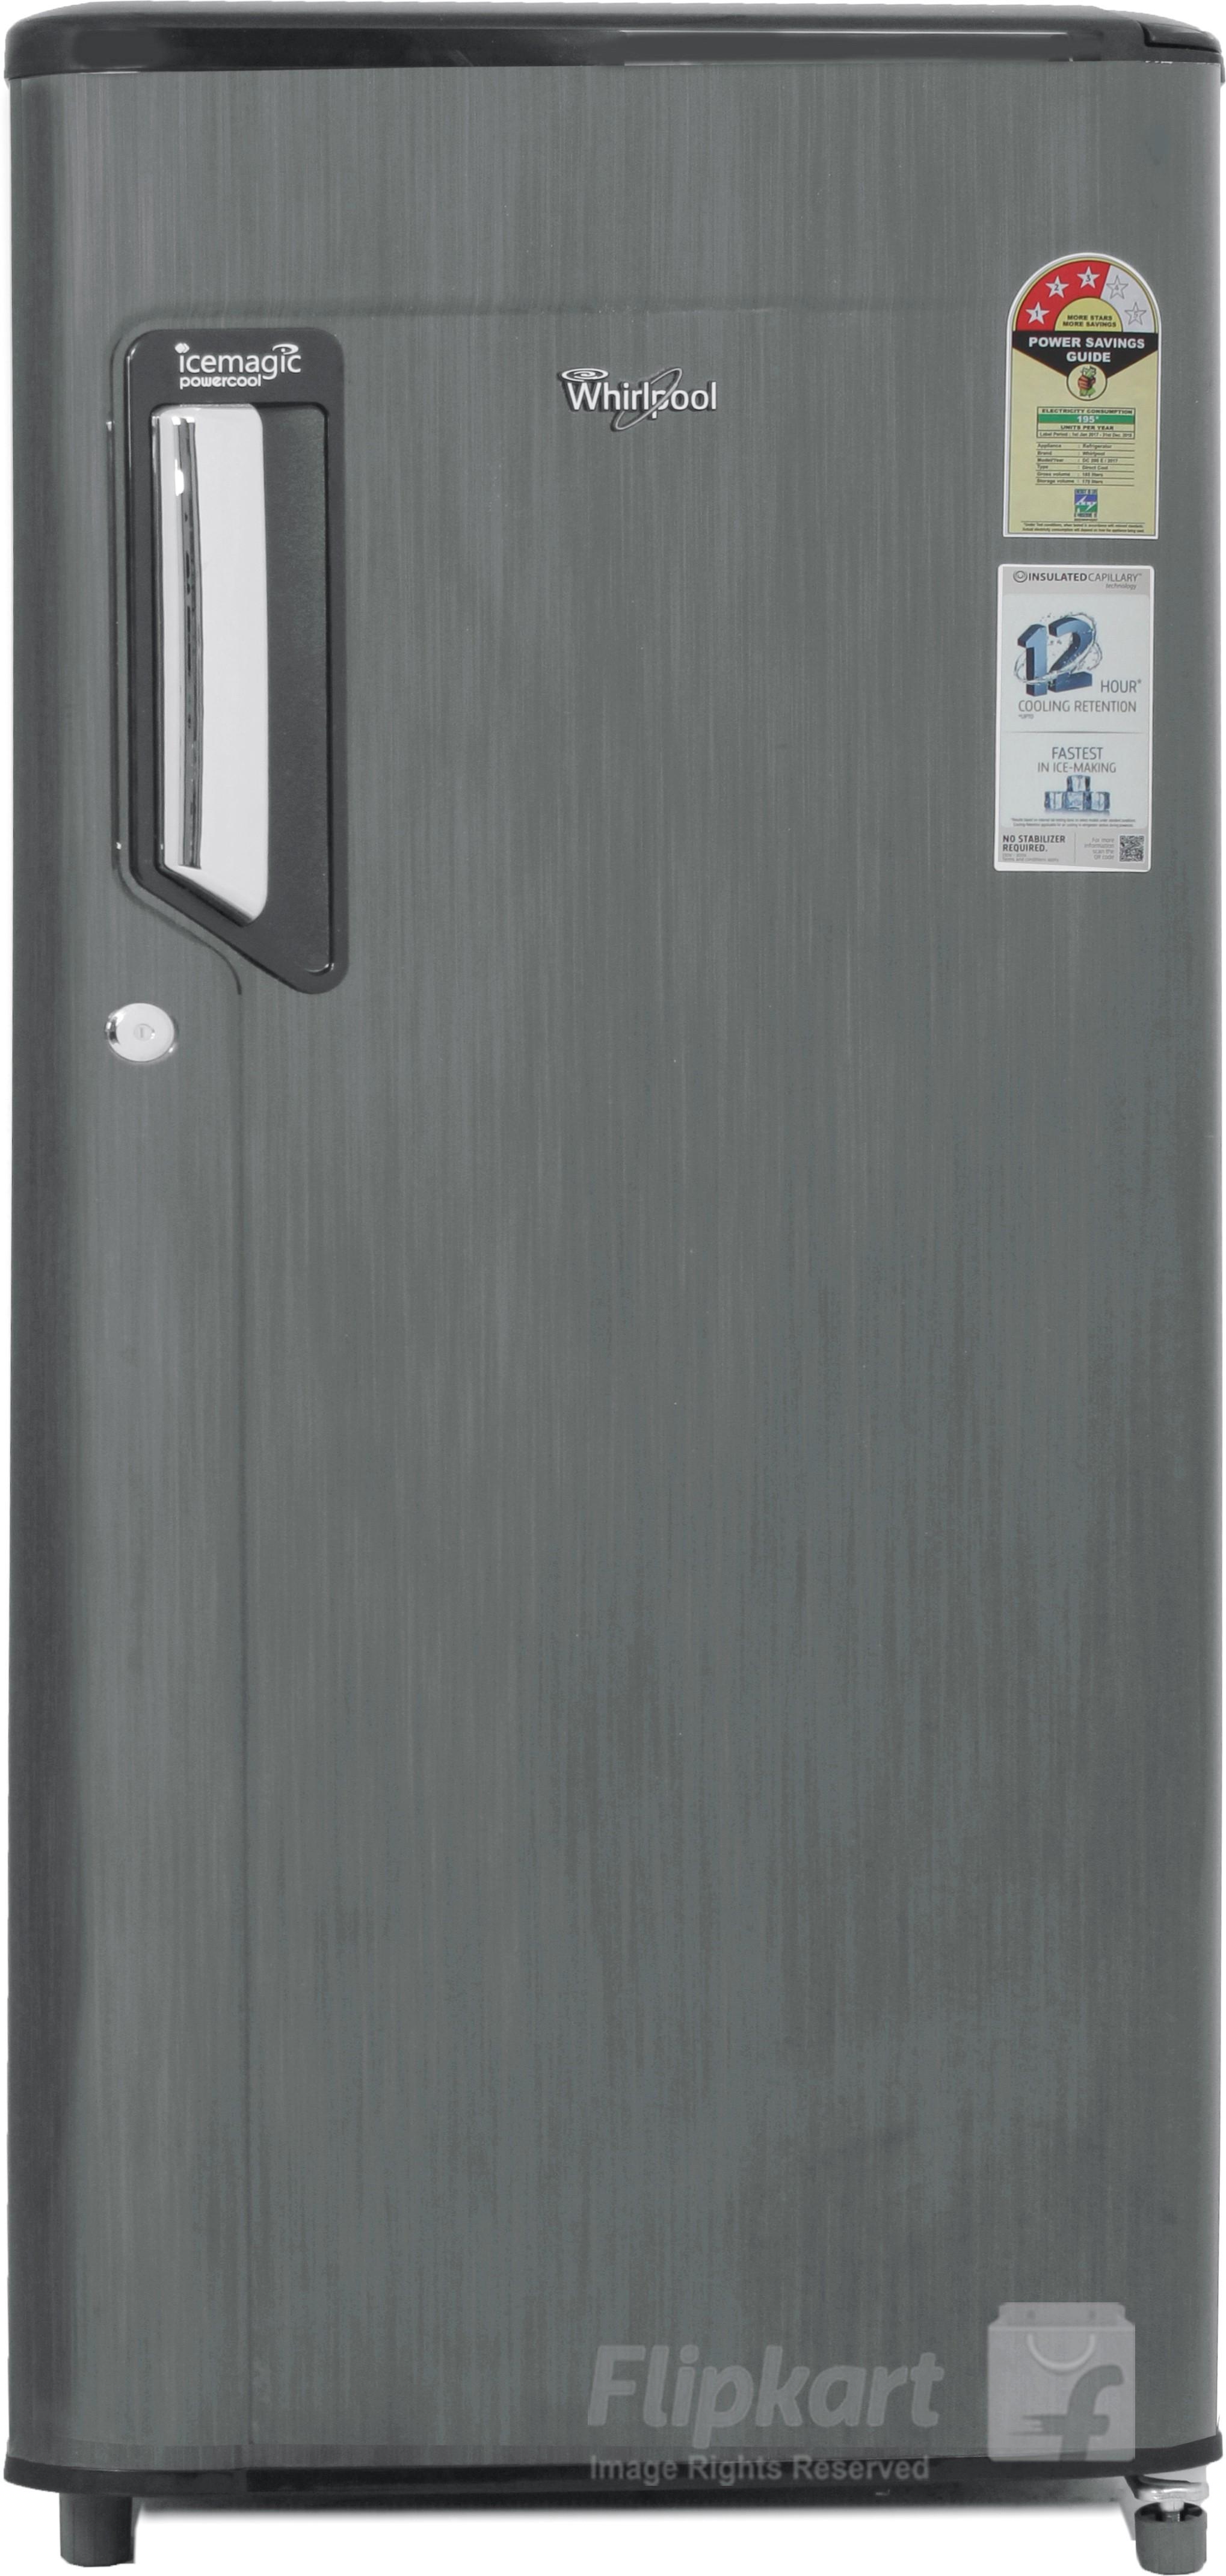 Whirlpool 185 L Direct Cool Single Door Refrigerator(200 IMPWCOOL PRM 3S, Grey Titanium, 2017)   Refrigerator  (Whirlpool)